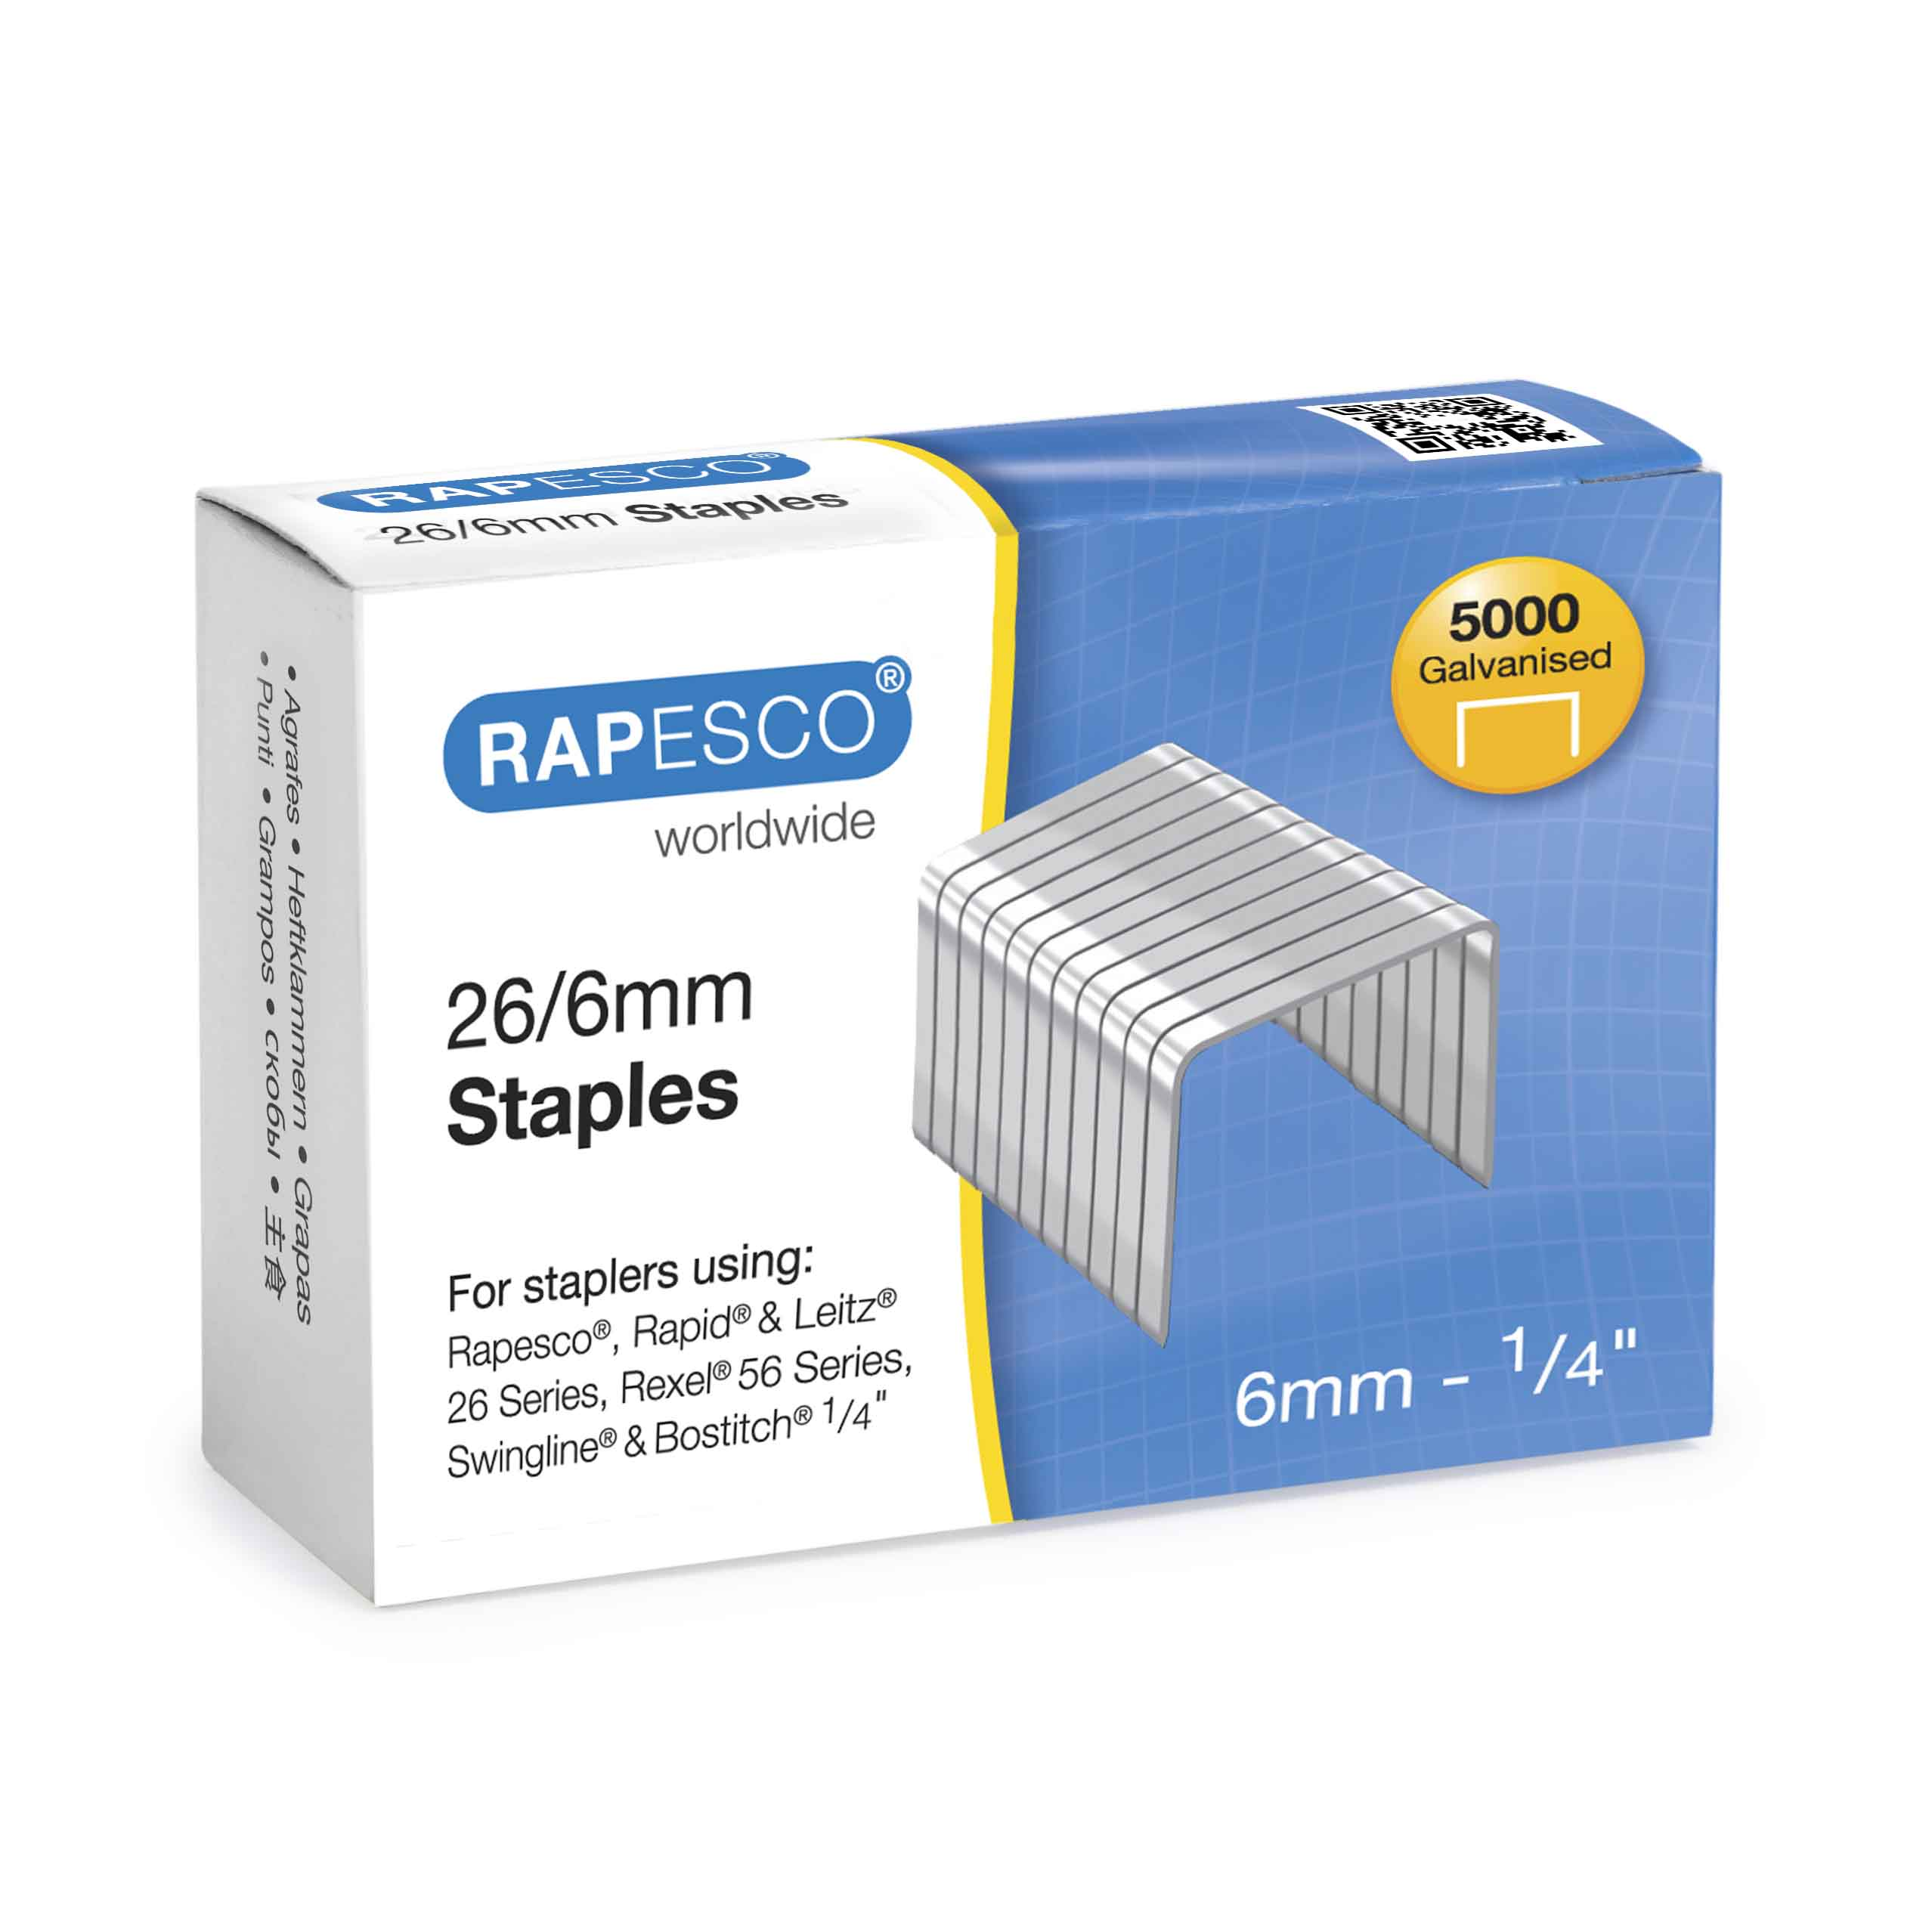 Rapesco 26/6mm Staples PK5000